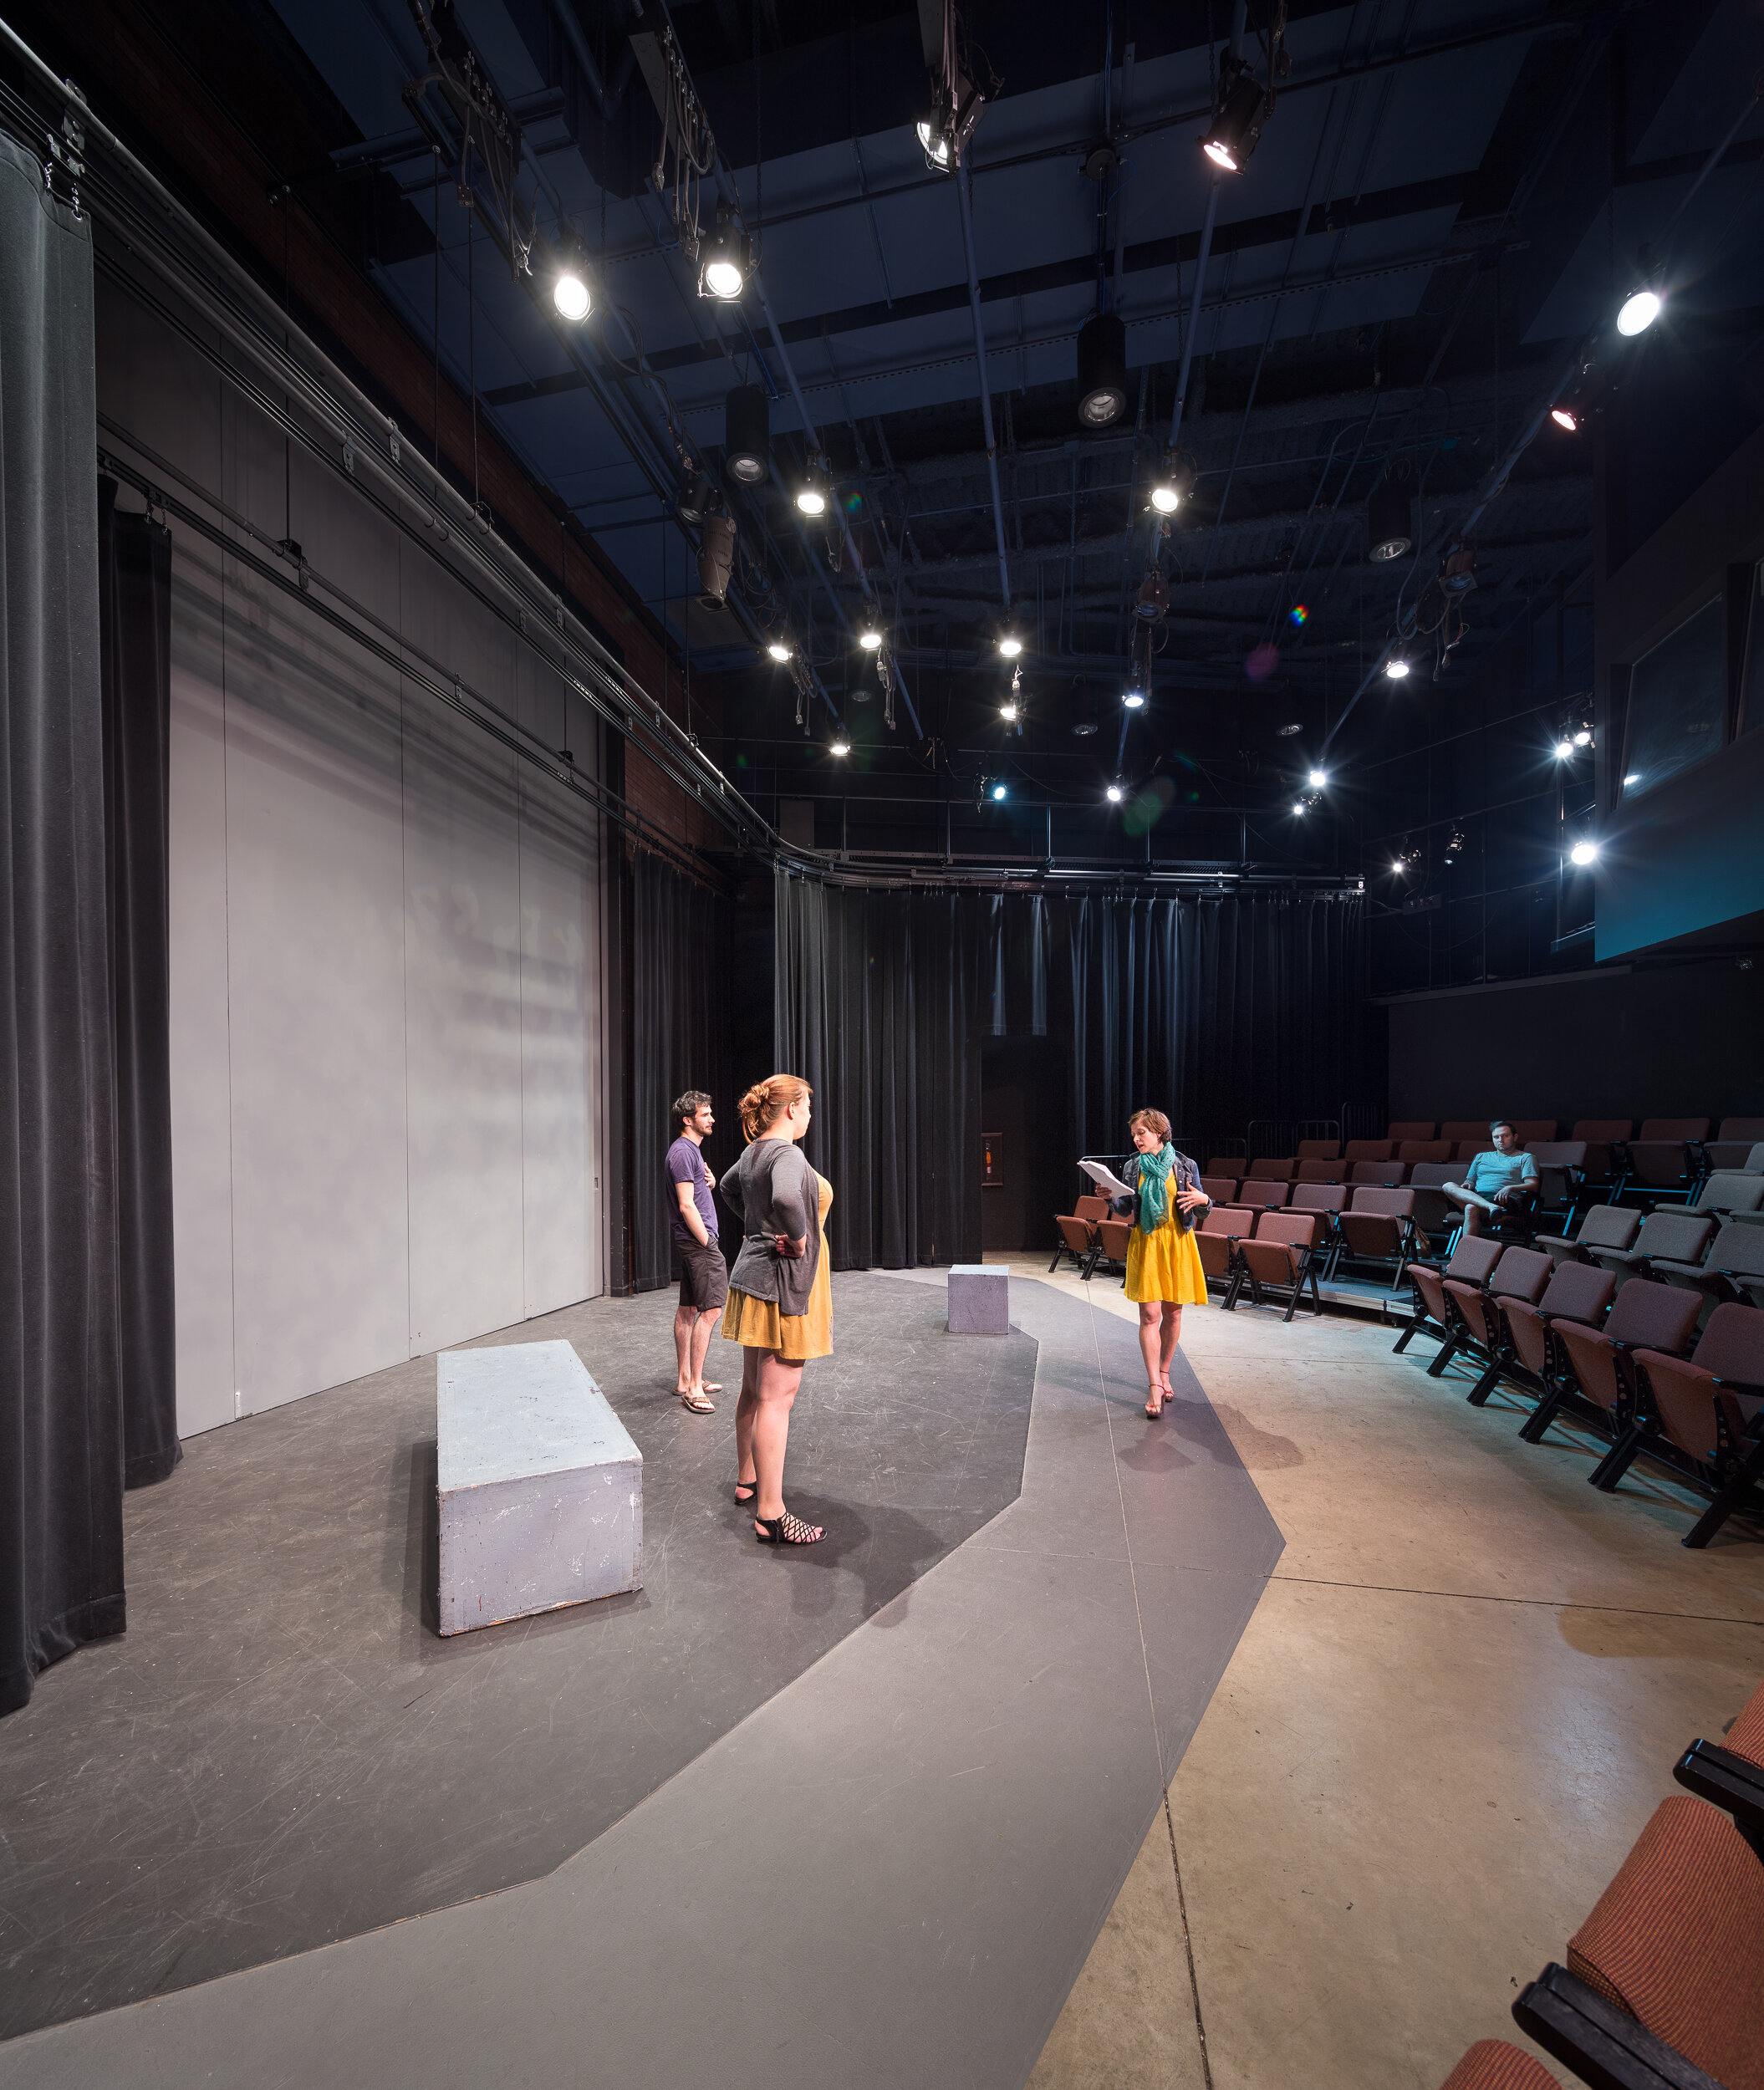 95-OSU-Withycombe-JoshPartee-7489-theatre.jpg